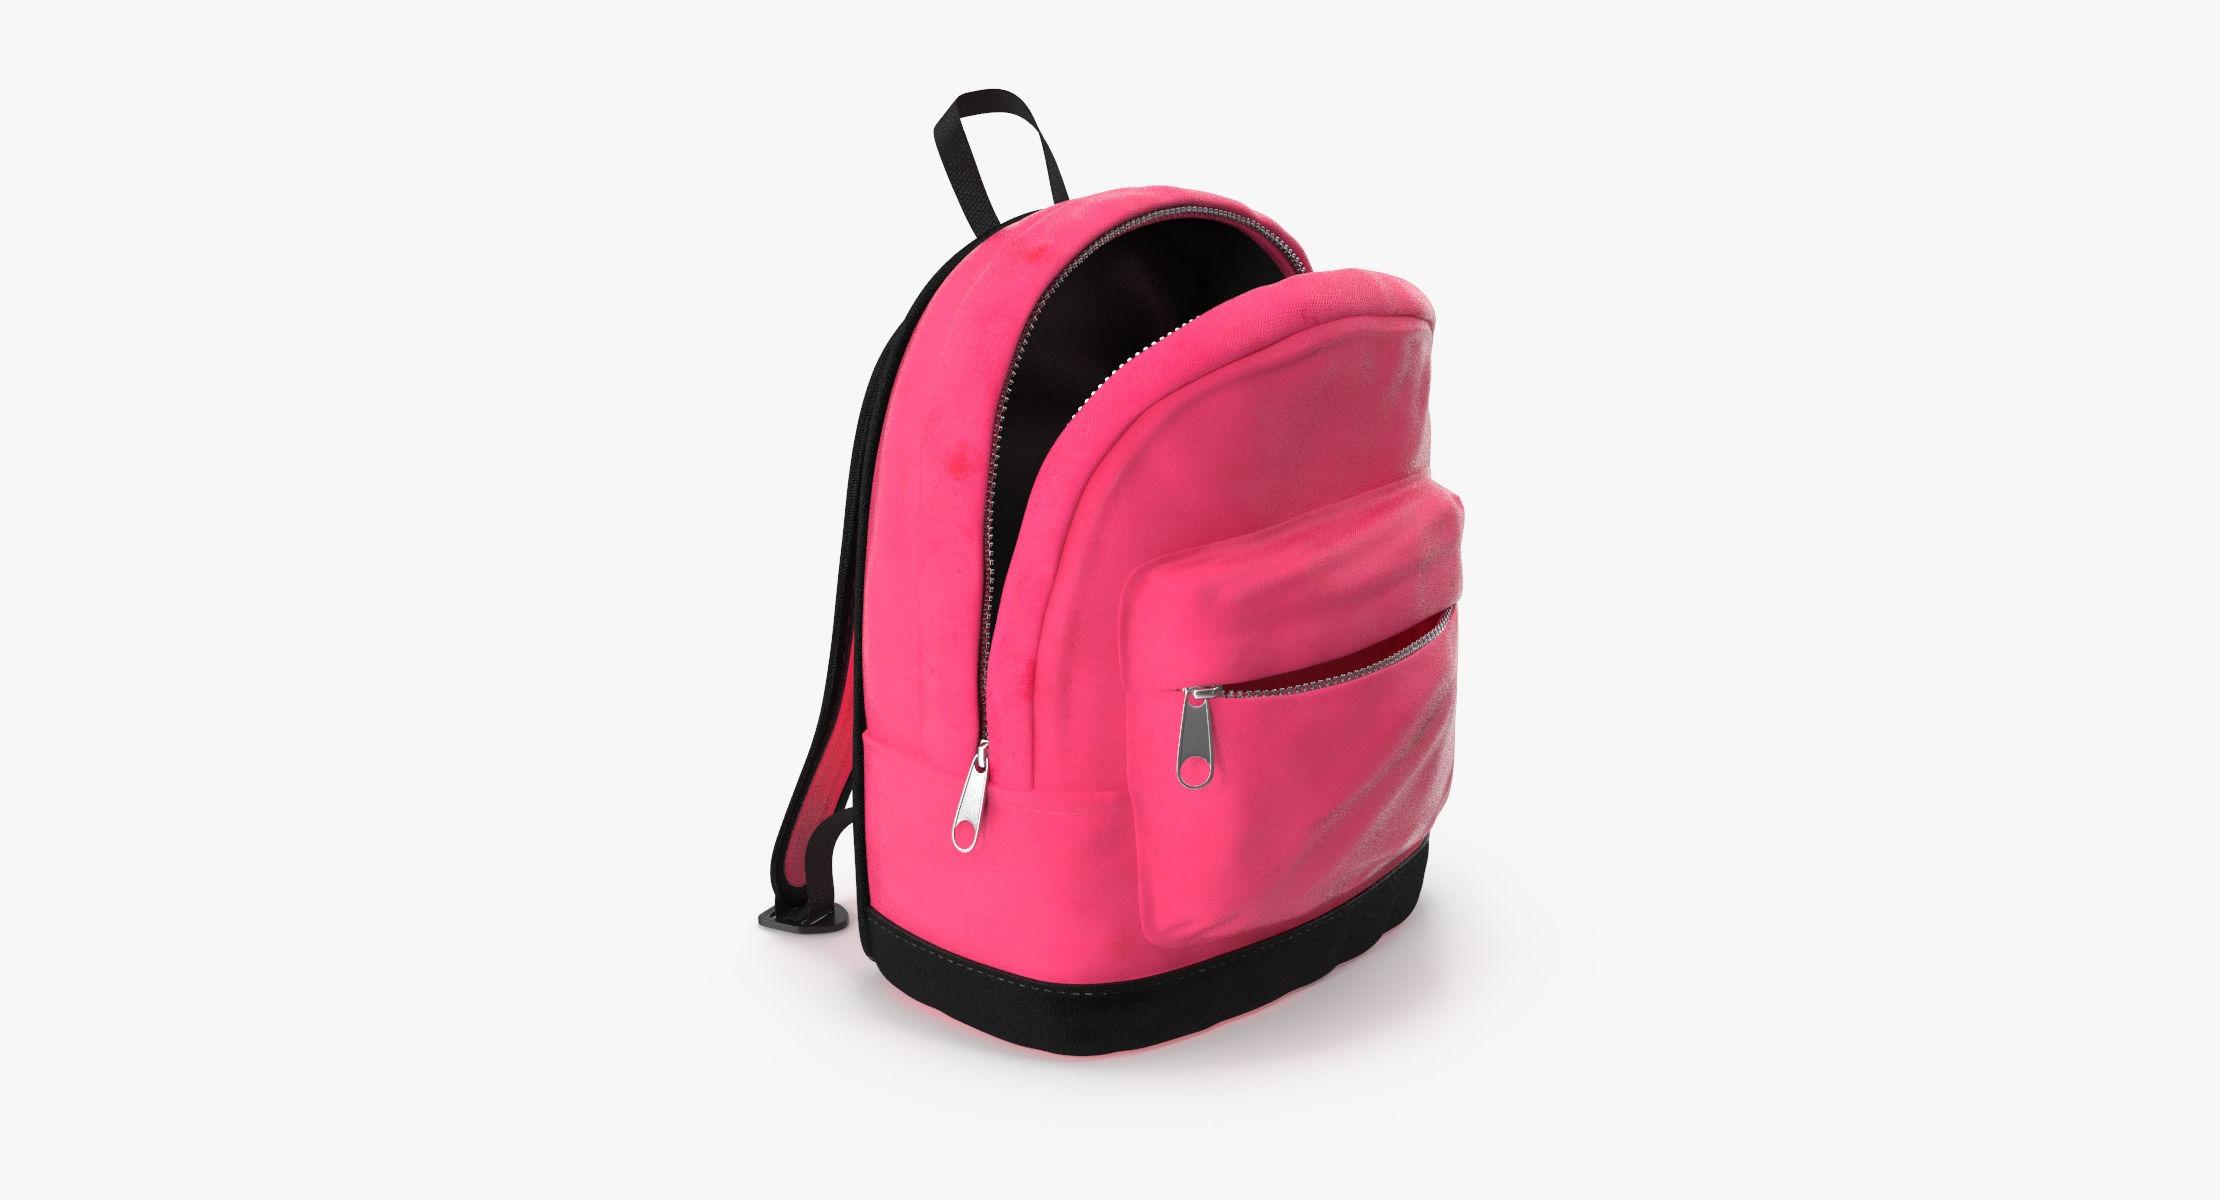 Small Kids Backpack Standing - reel 1